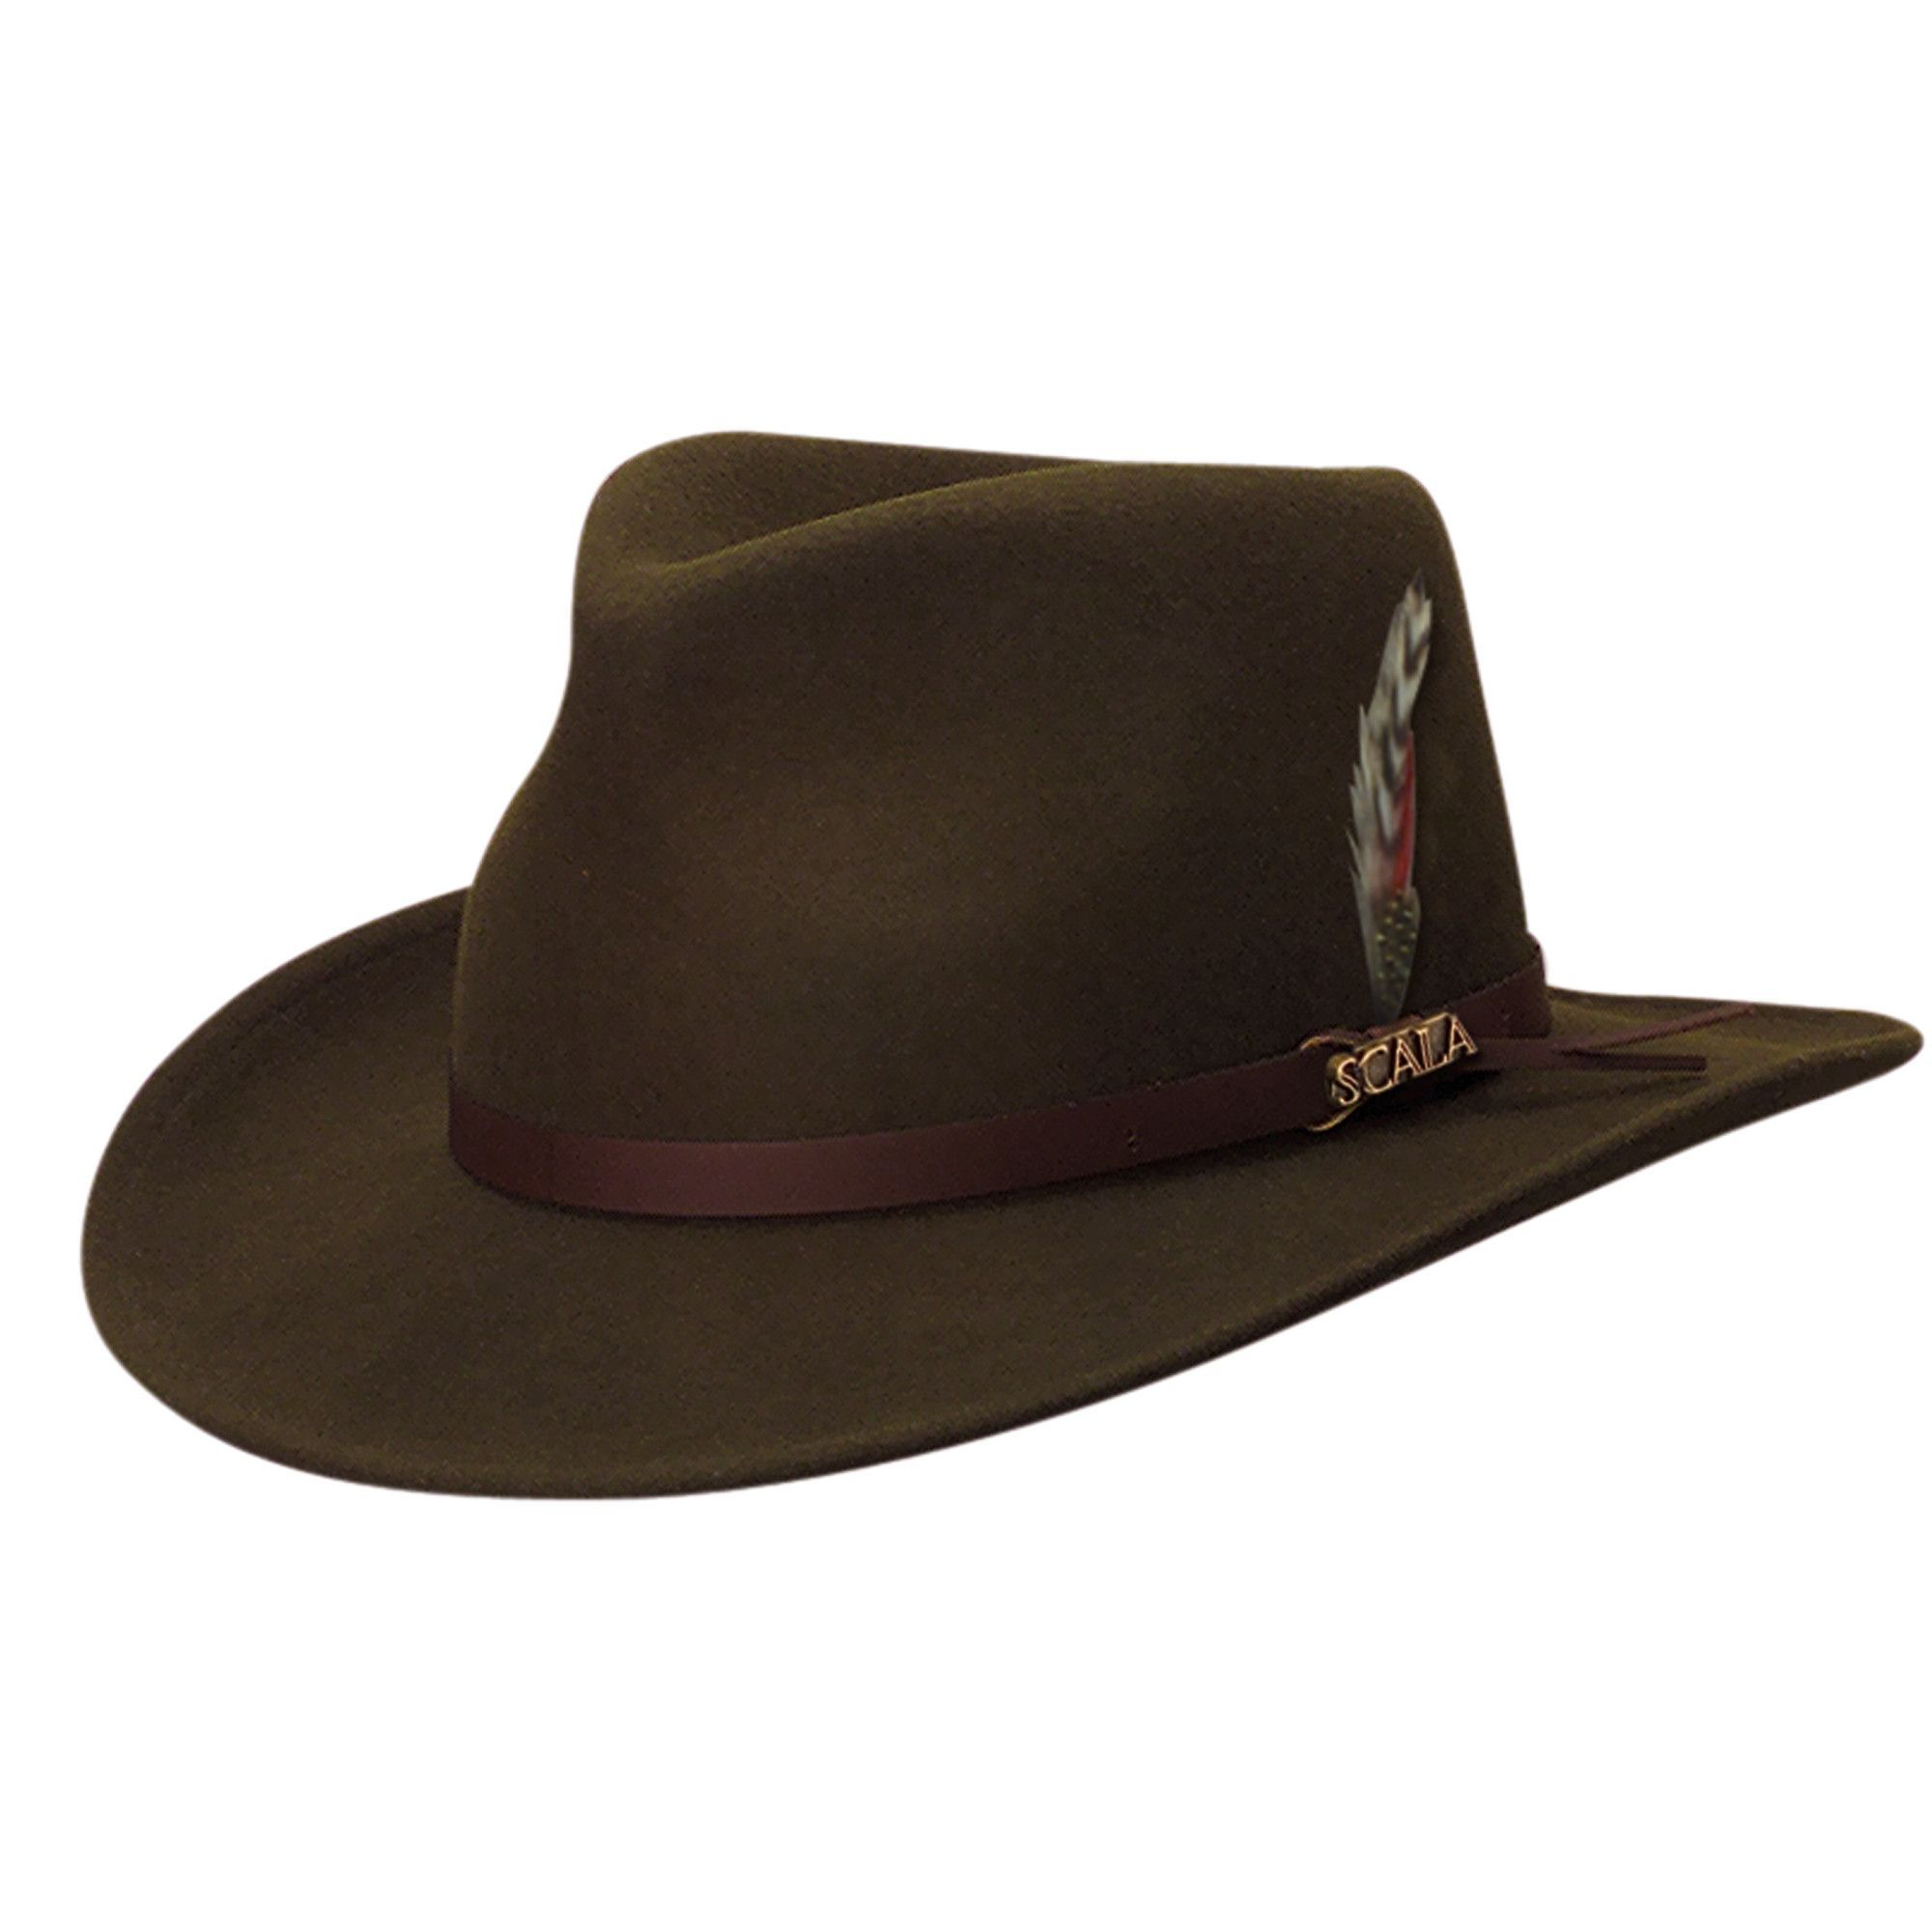 73879189bcc7f Scala Men's Wool Felt Water Repellent Crushable Fedora Hat   Stetson Hat